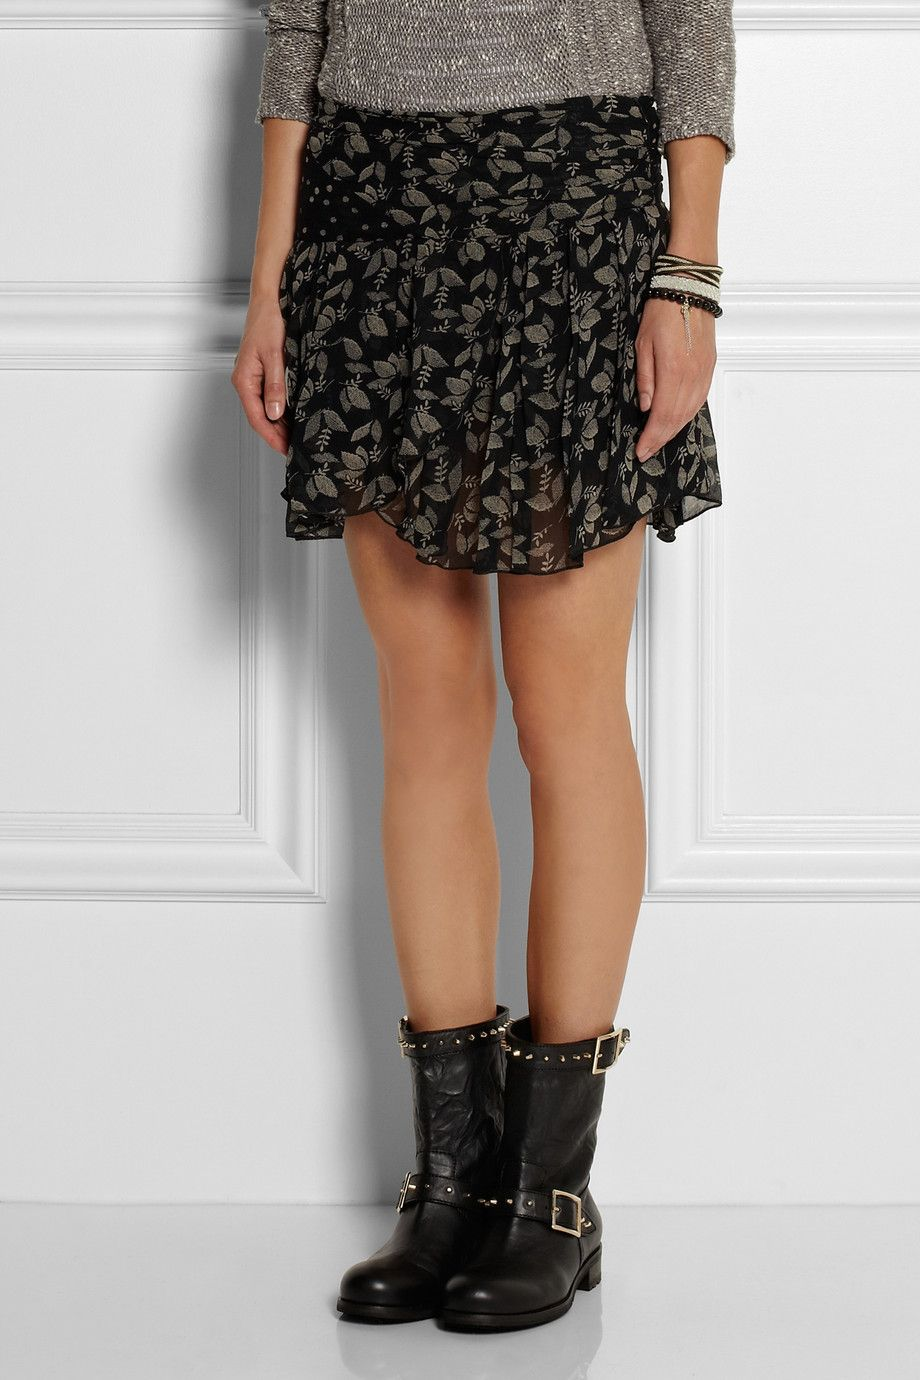 ec764aae94a4 Étoile Isabel Marant | Prune printed georgette mini skirt | NET-A-PORTER.COM